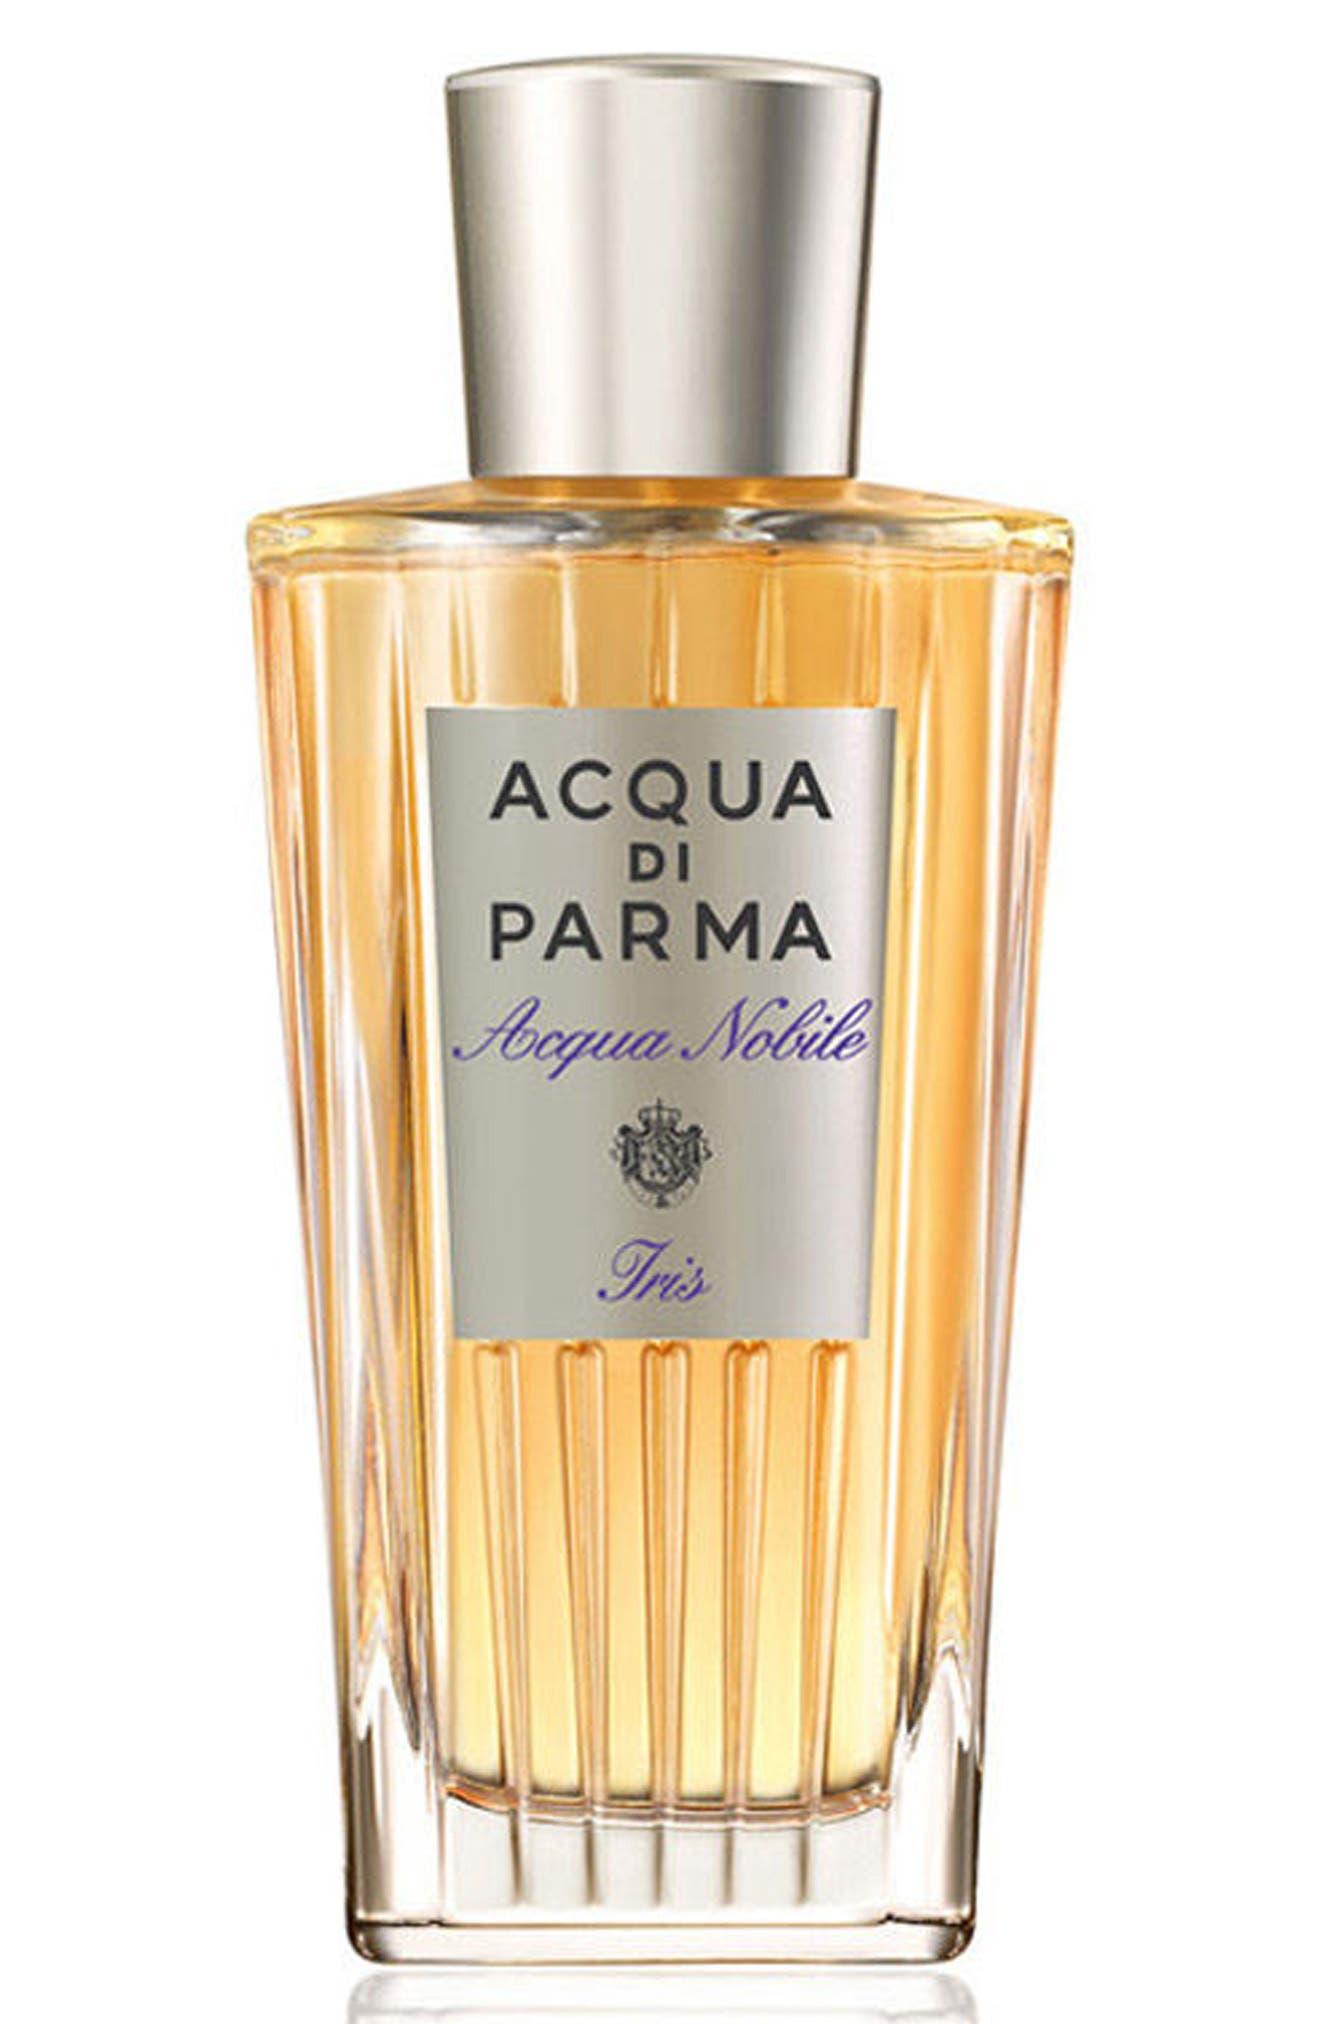 ACQUA DI PARMA Acqua Nobili Iris Fragrance, Main, color, 000